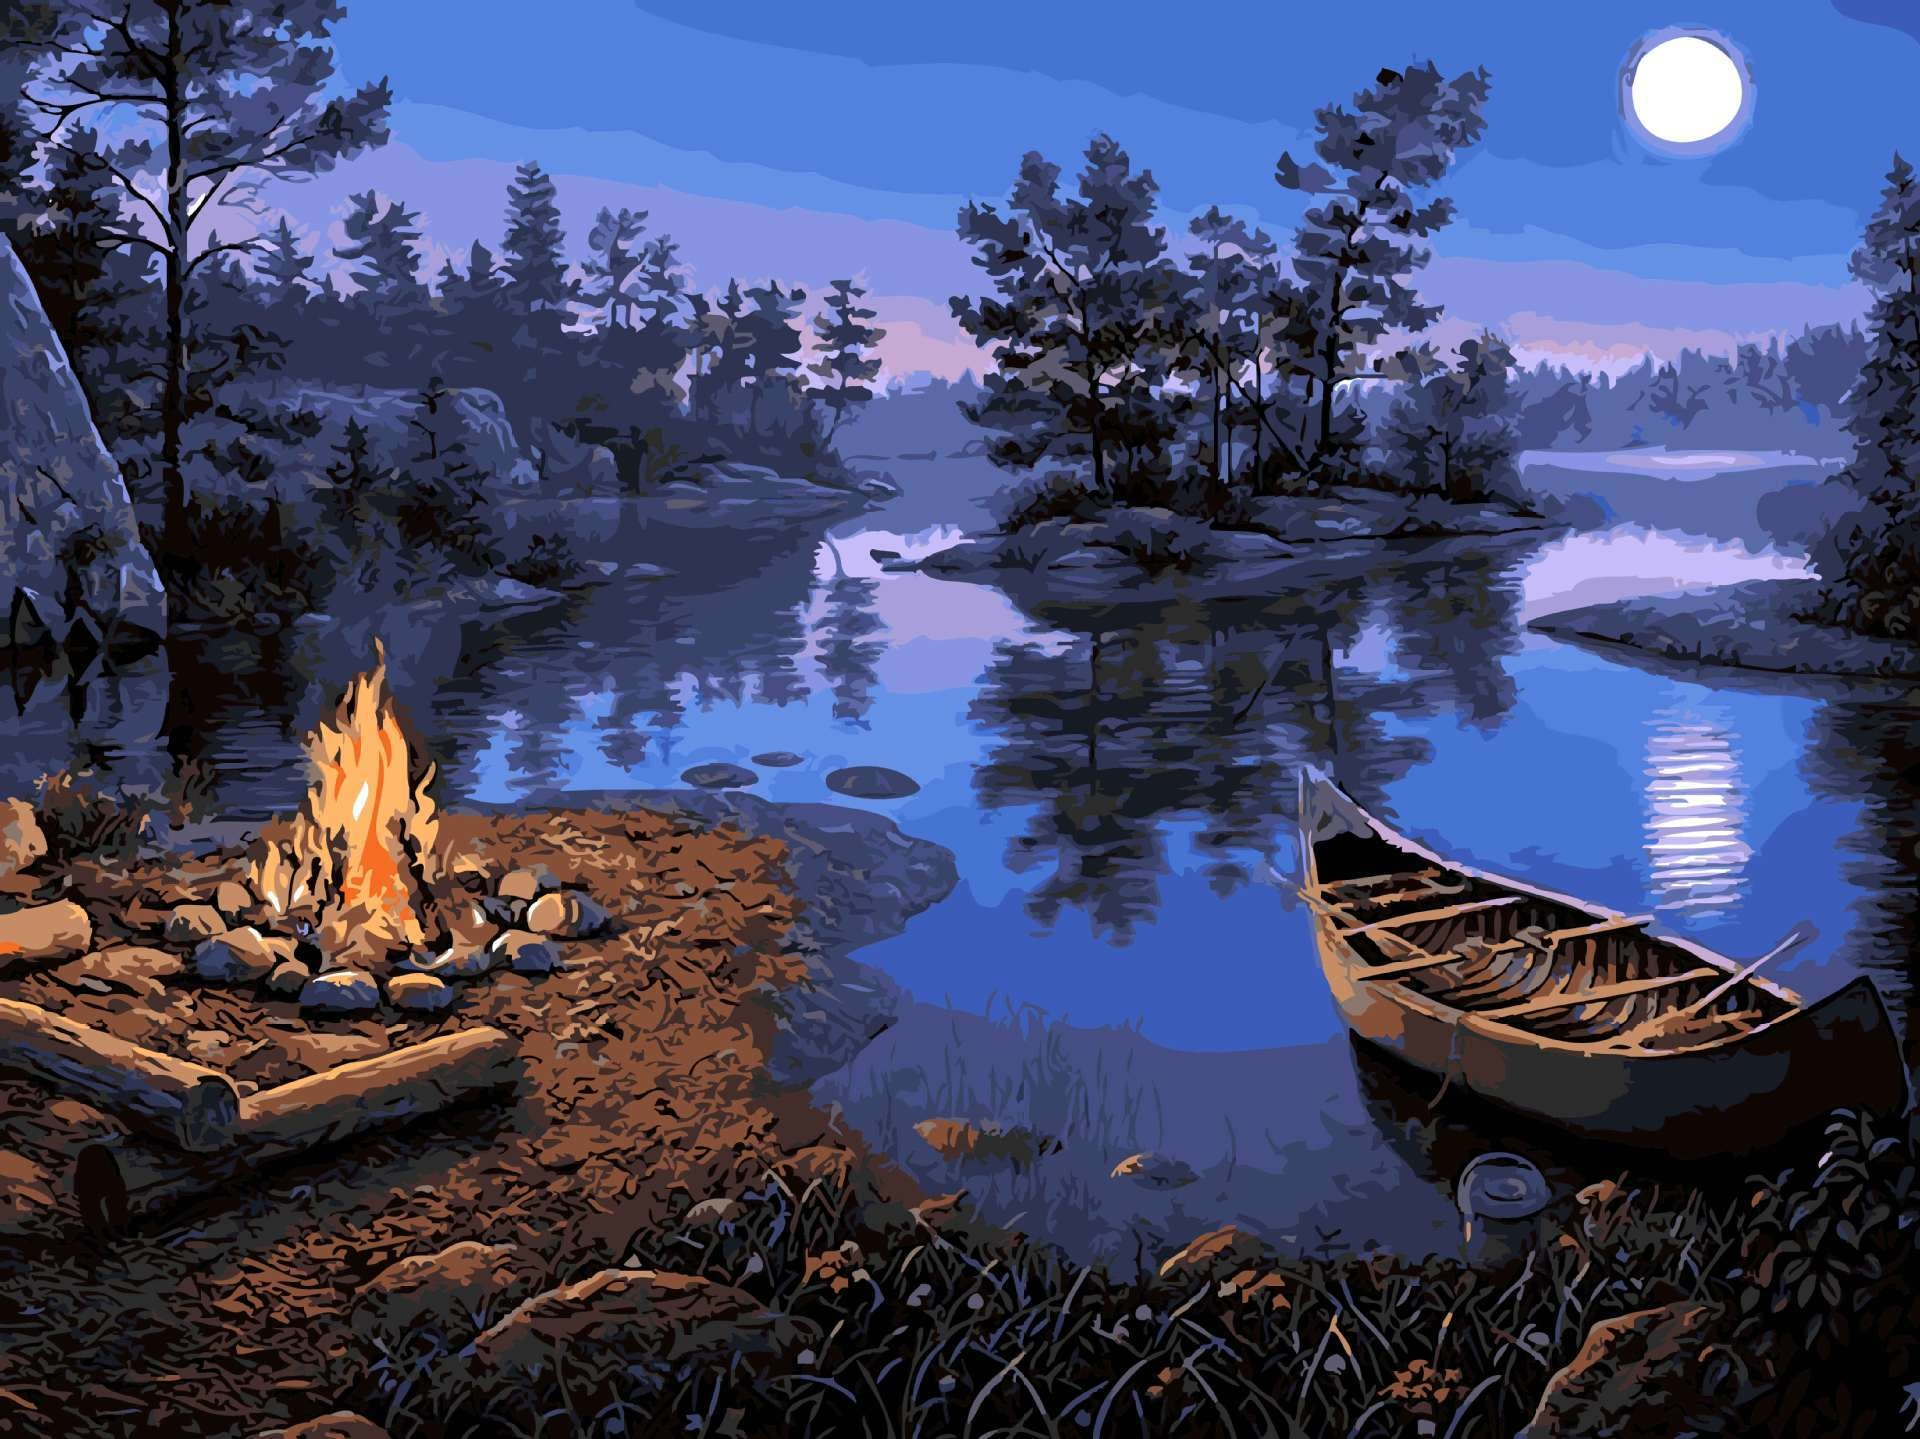 Campfire on Lake DIY Painting